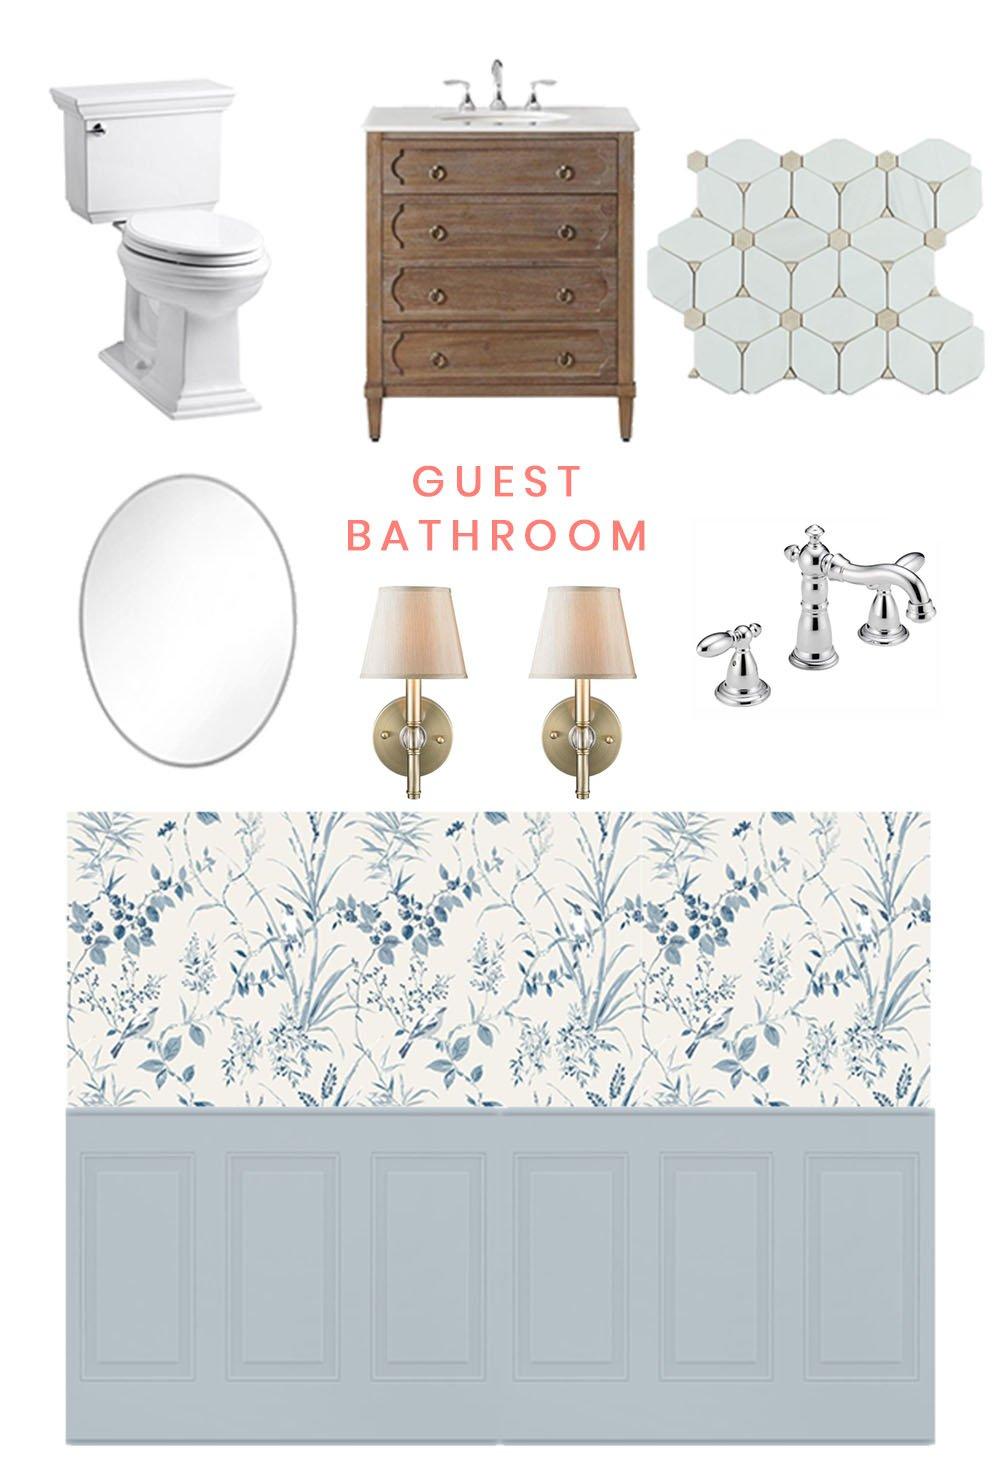 Guest Bathroom Renovation Plan